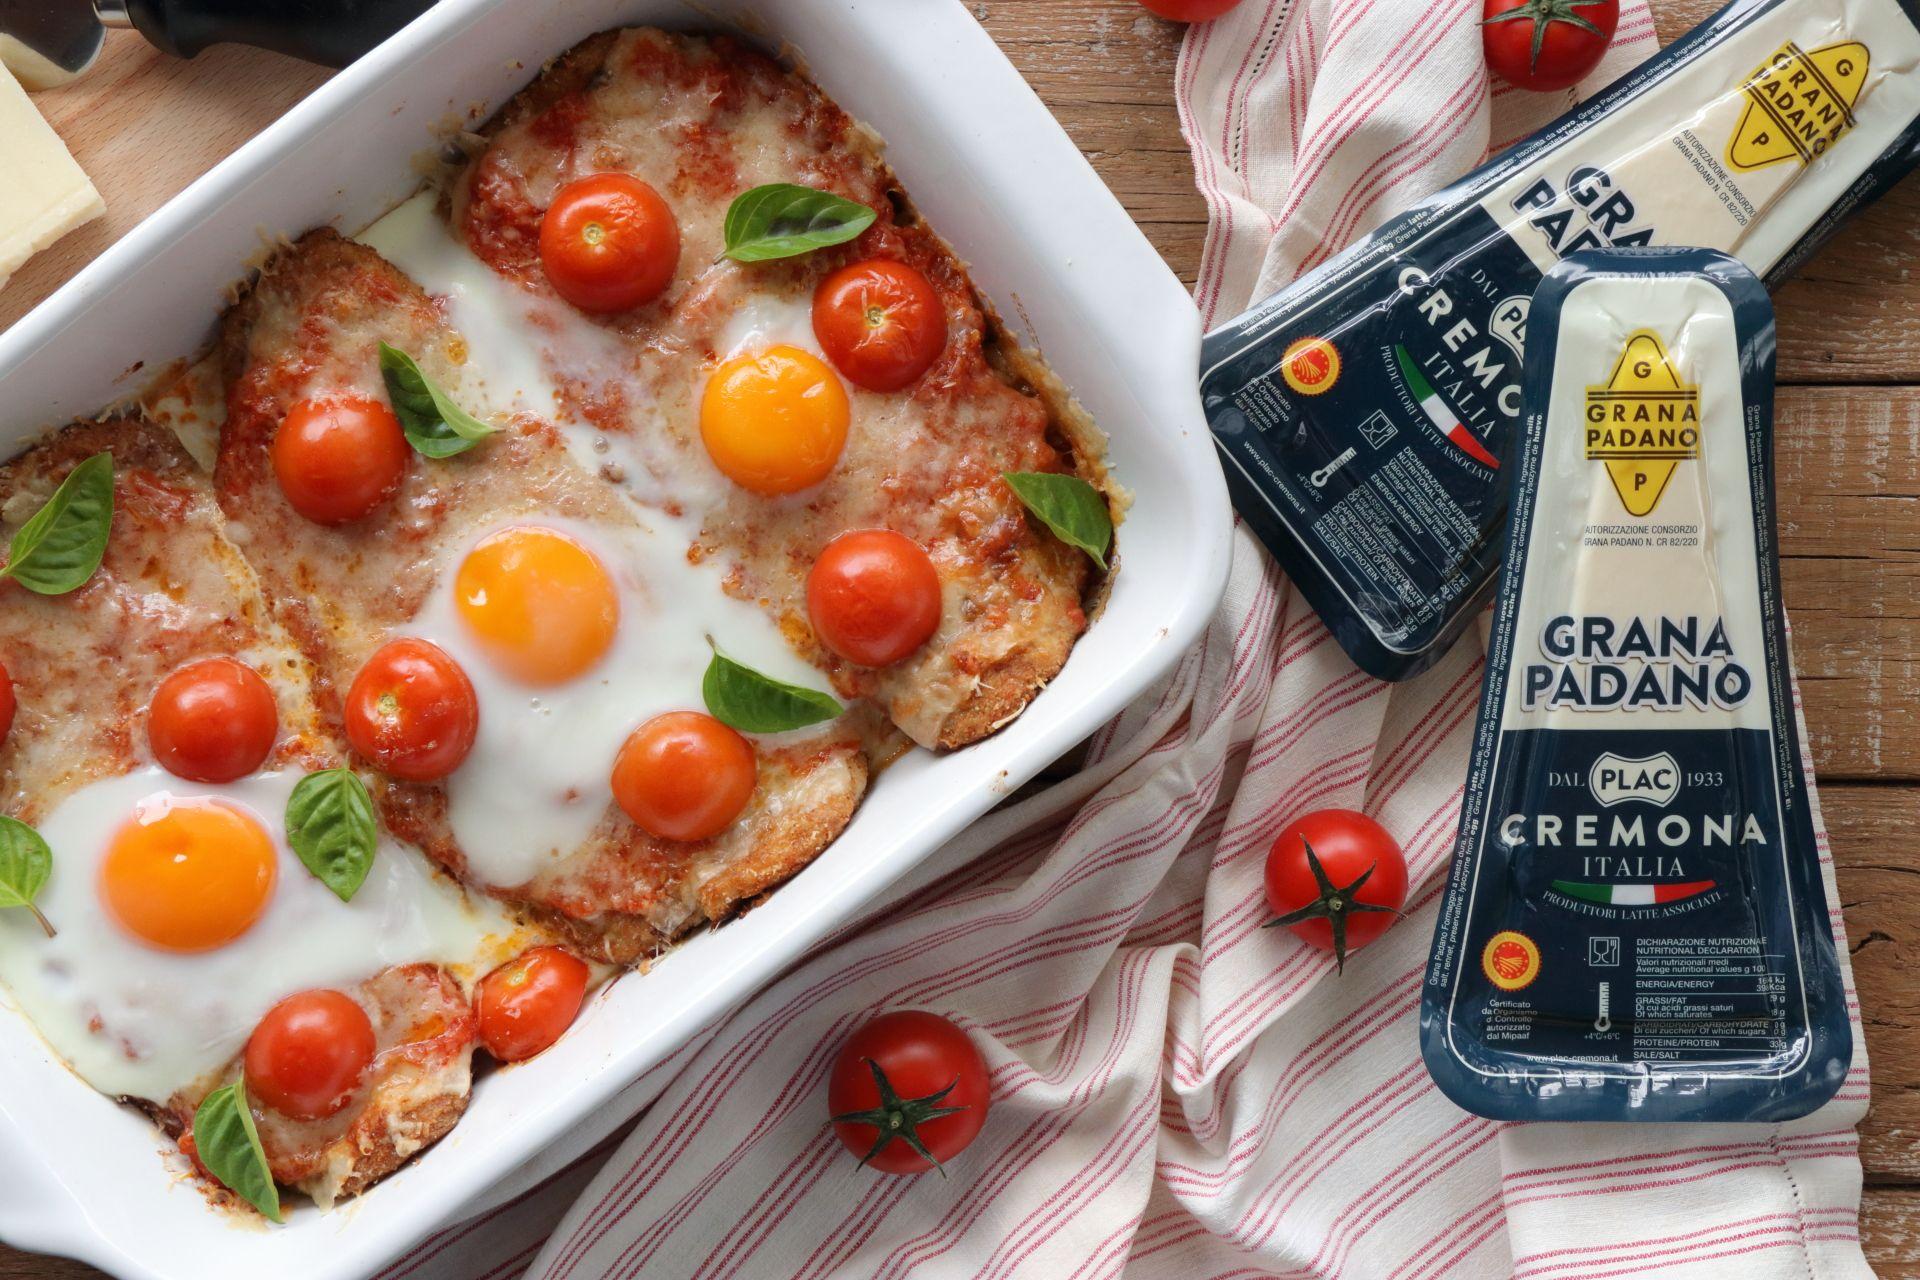 SQSP-Σνίτσελ-με-σάλτσα,-παρμεζάνα-και-αυγό-στο-φούρνο-IMG_4693_1-compressor.jpg